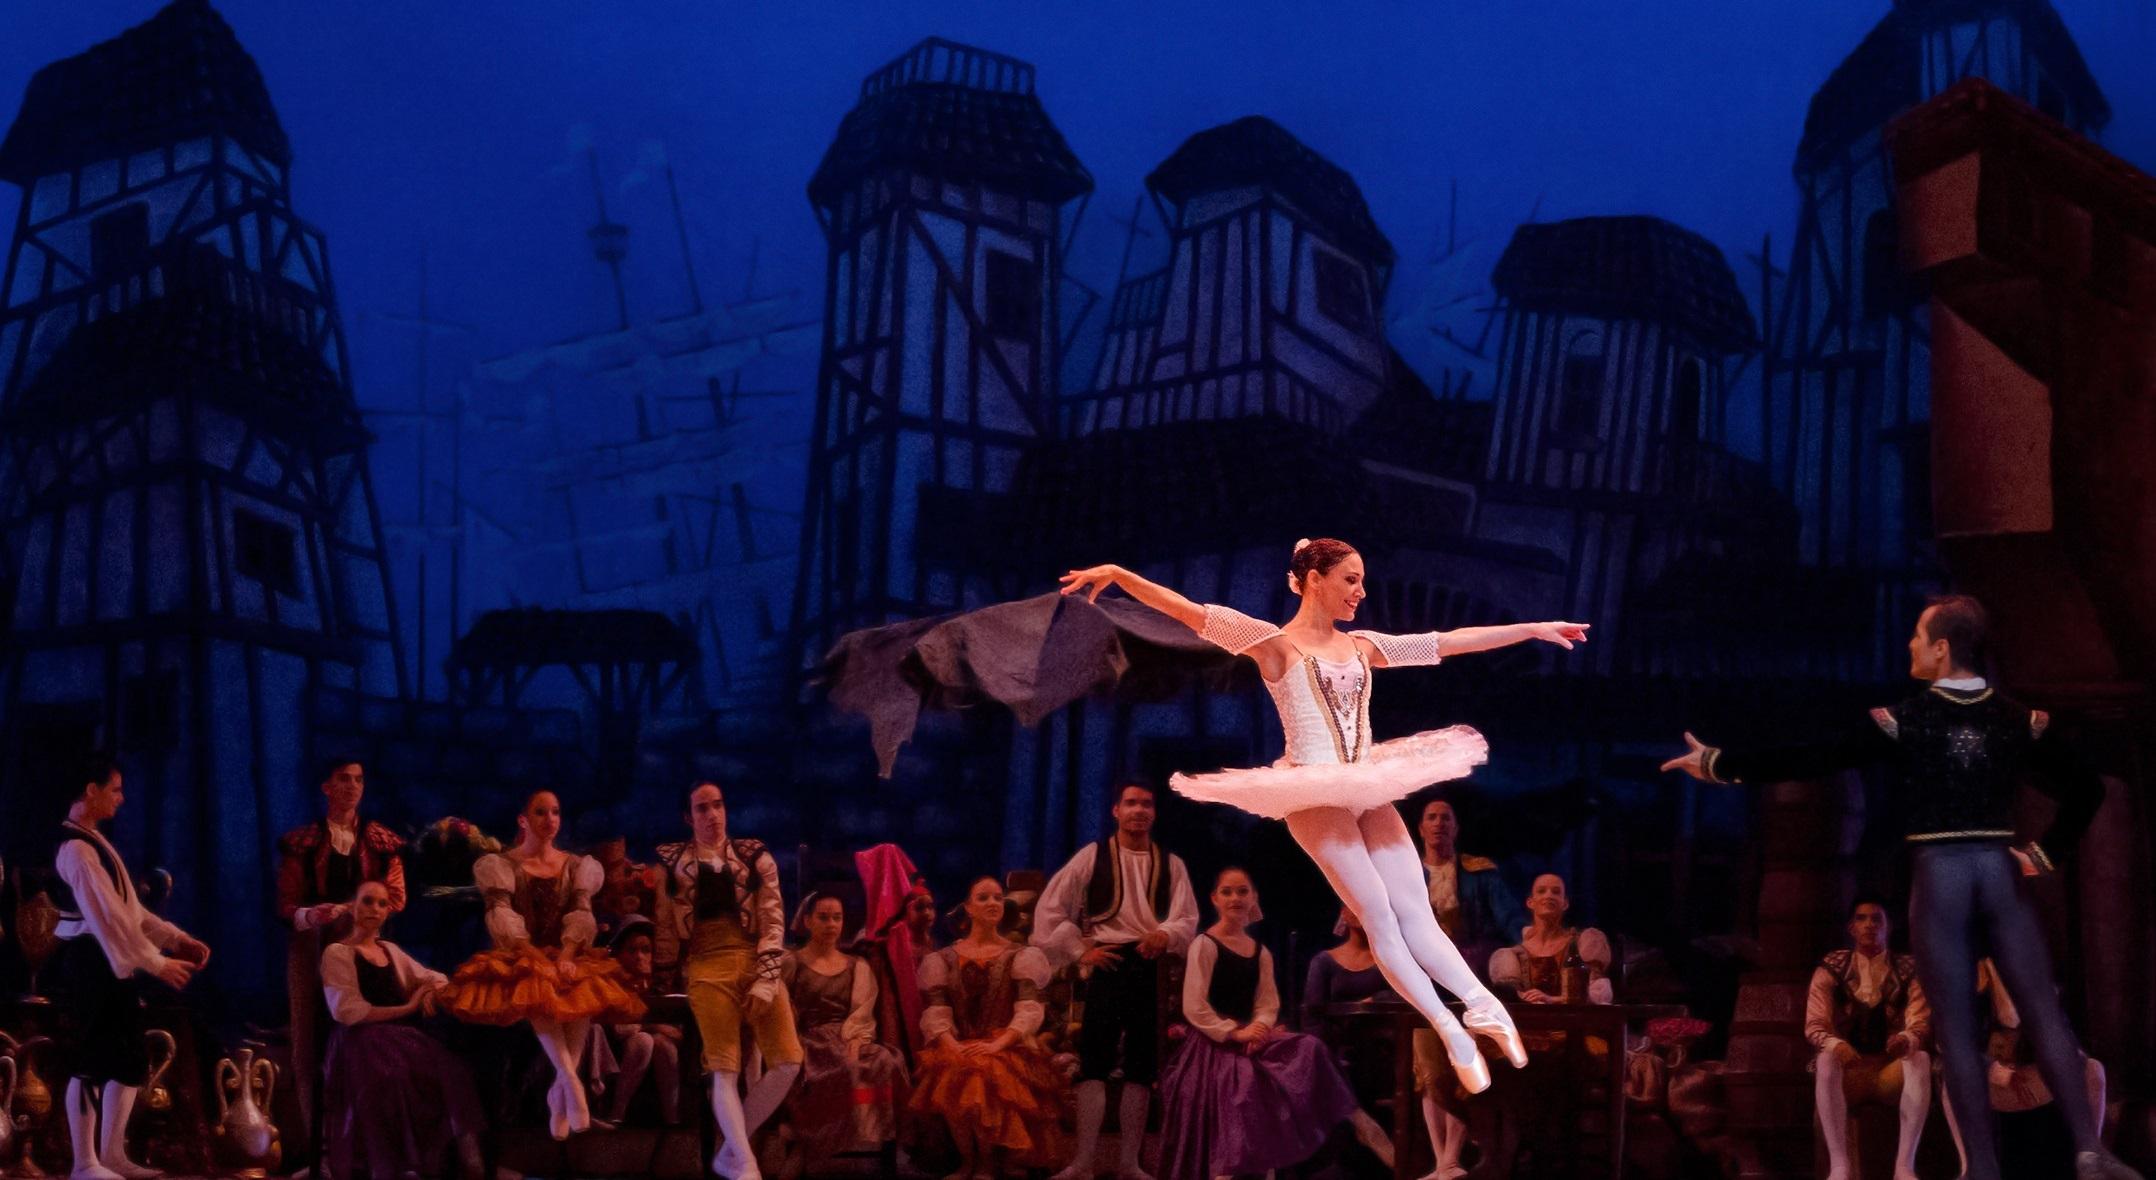 Free Images Audience Decoration Opera Decor Ballet Dancer